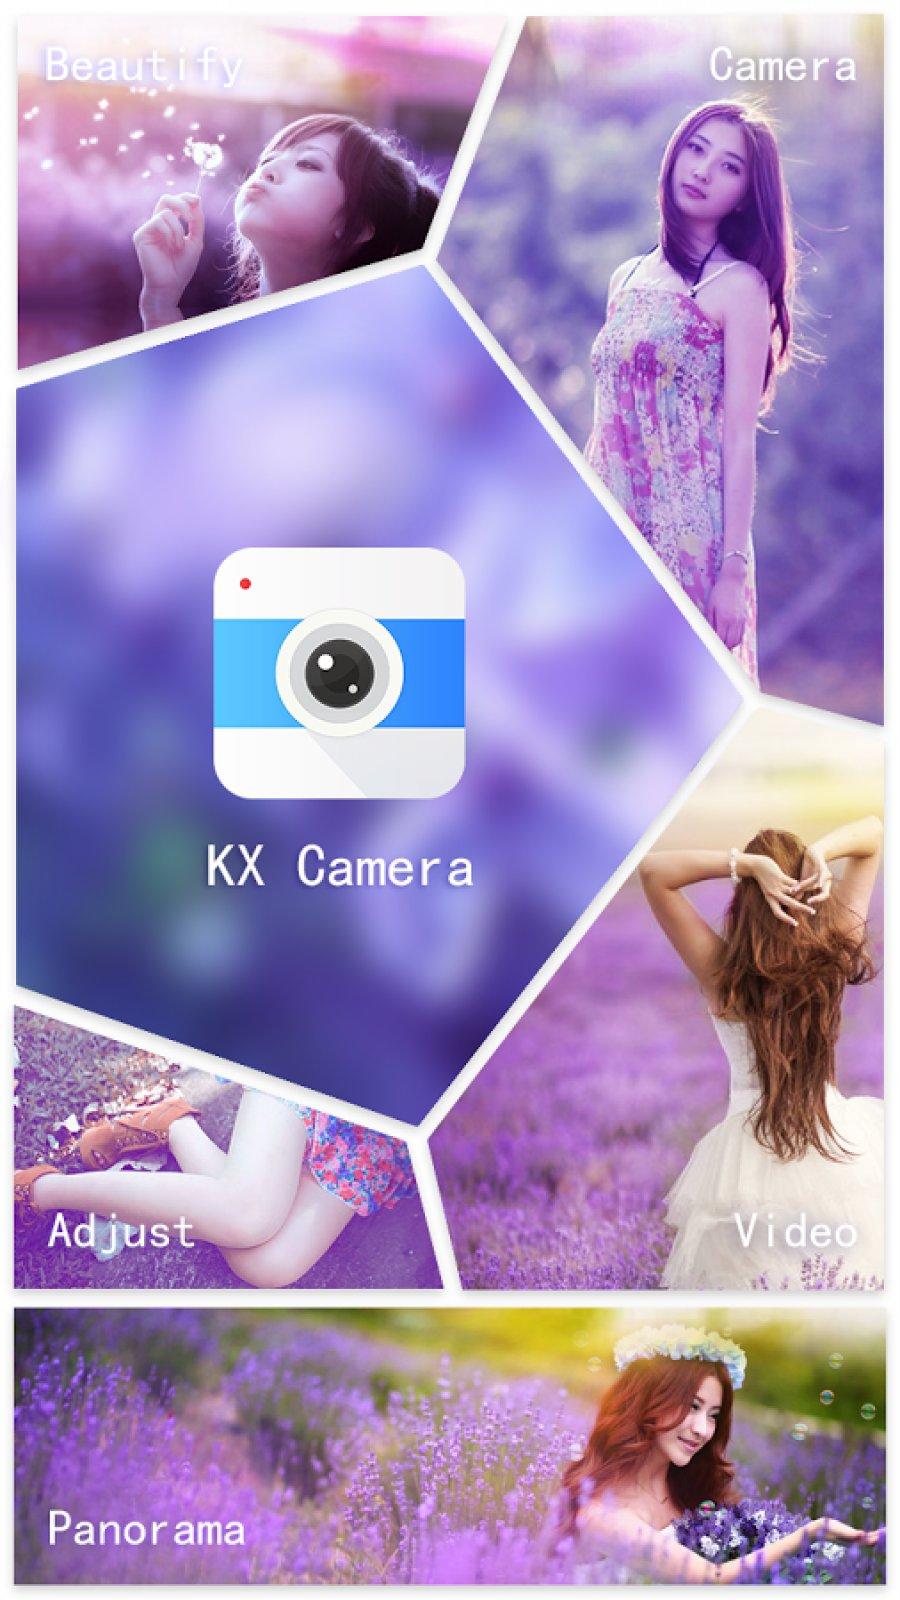 Camera - HD Cam, Photo Editor & Panorama